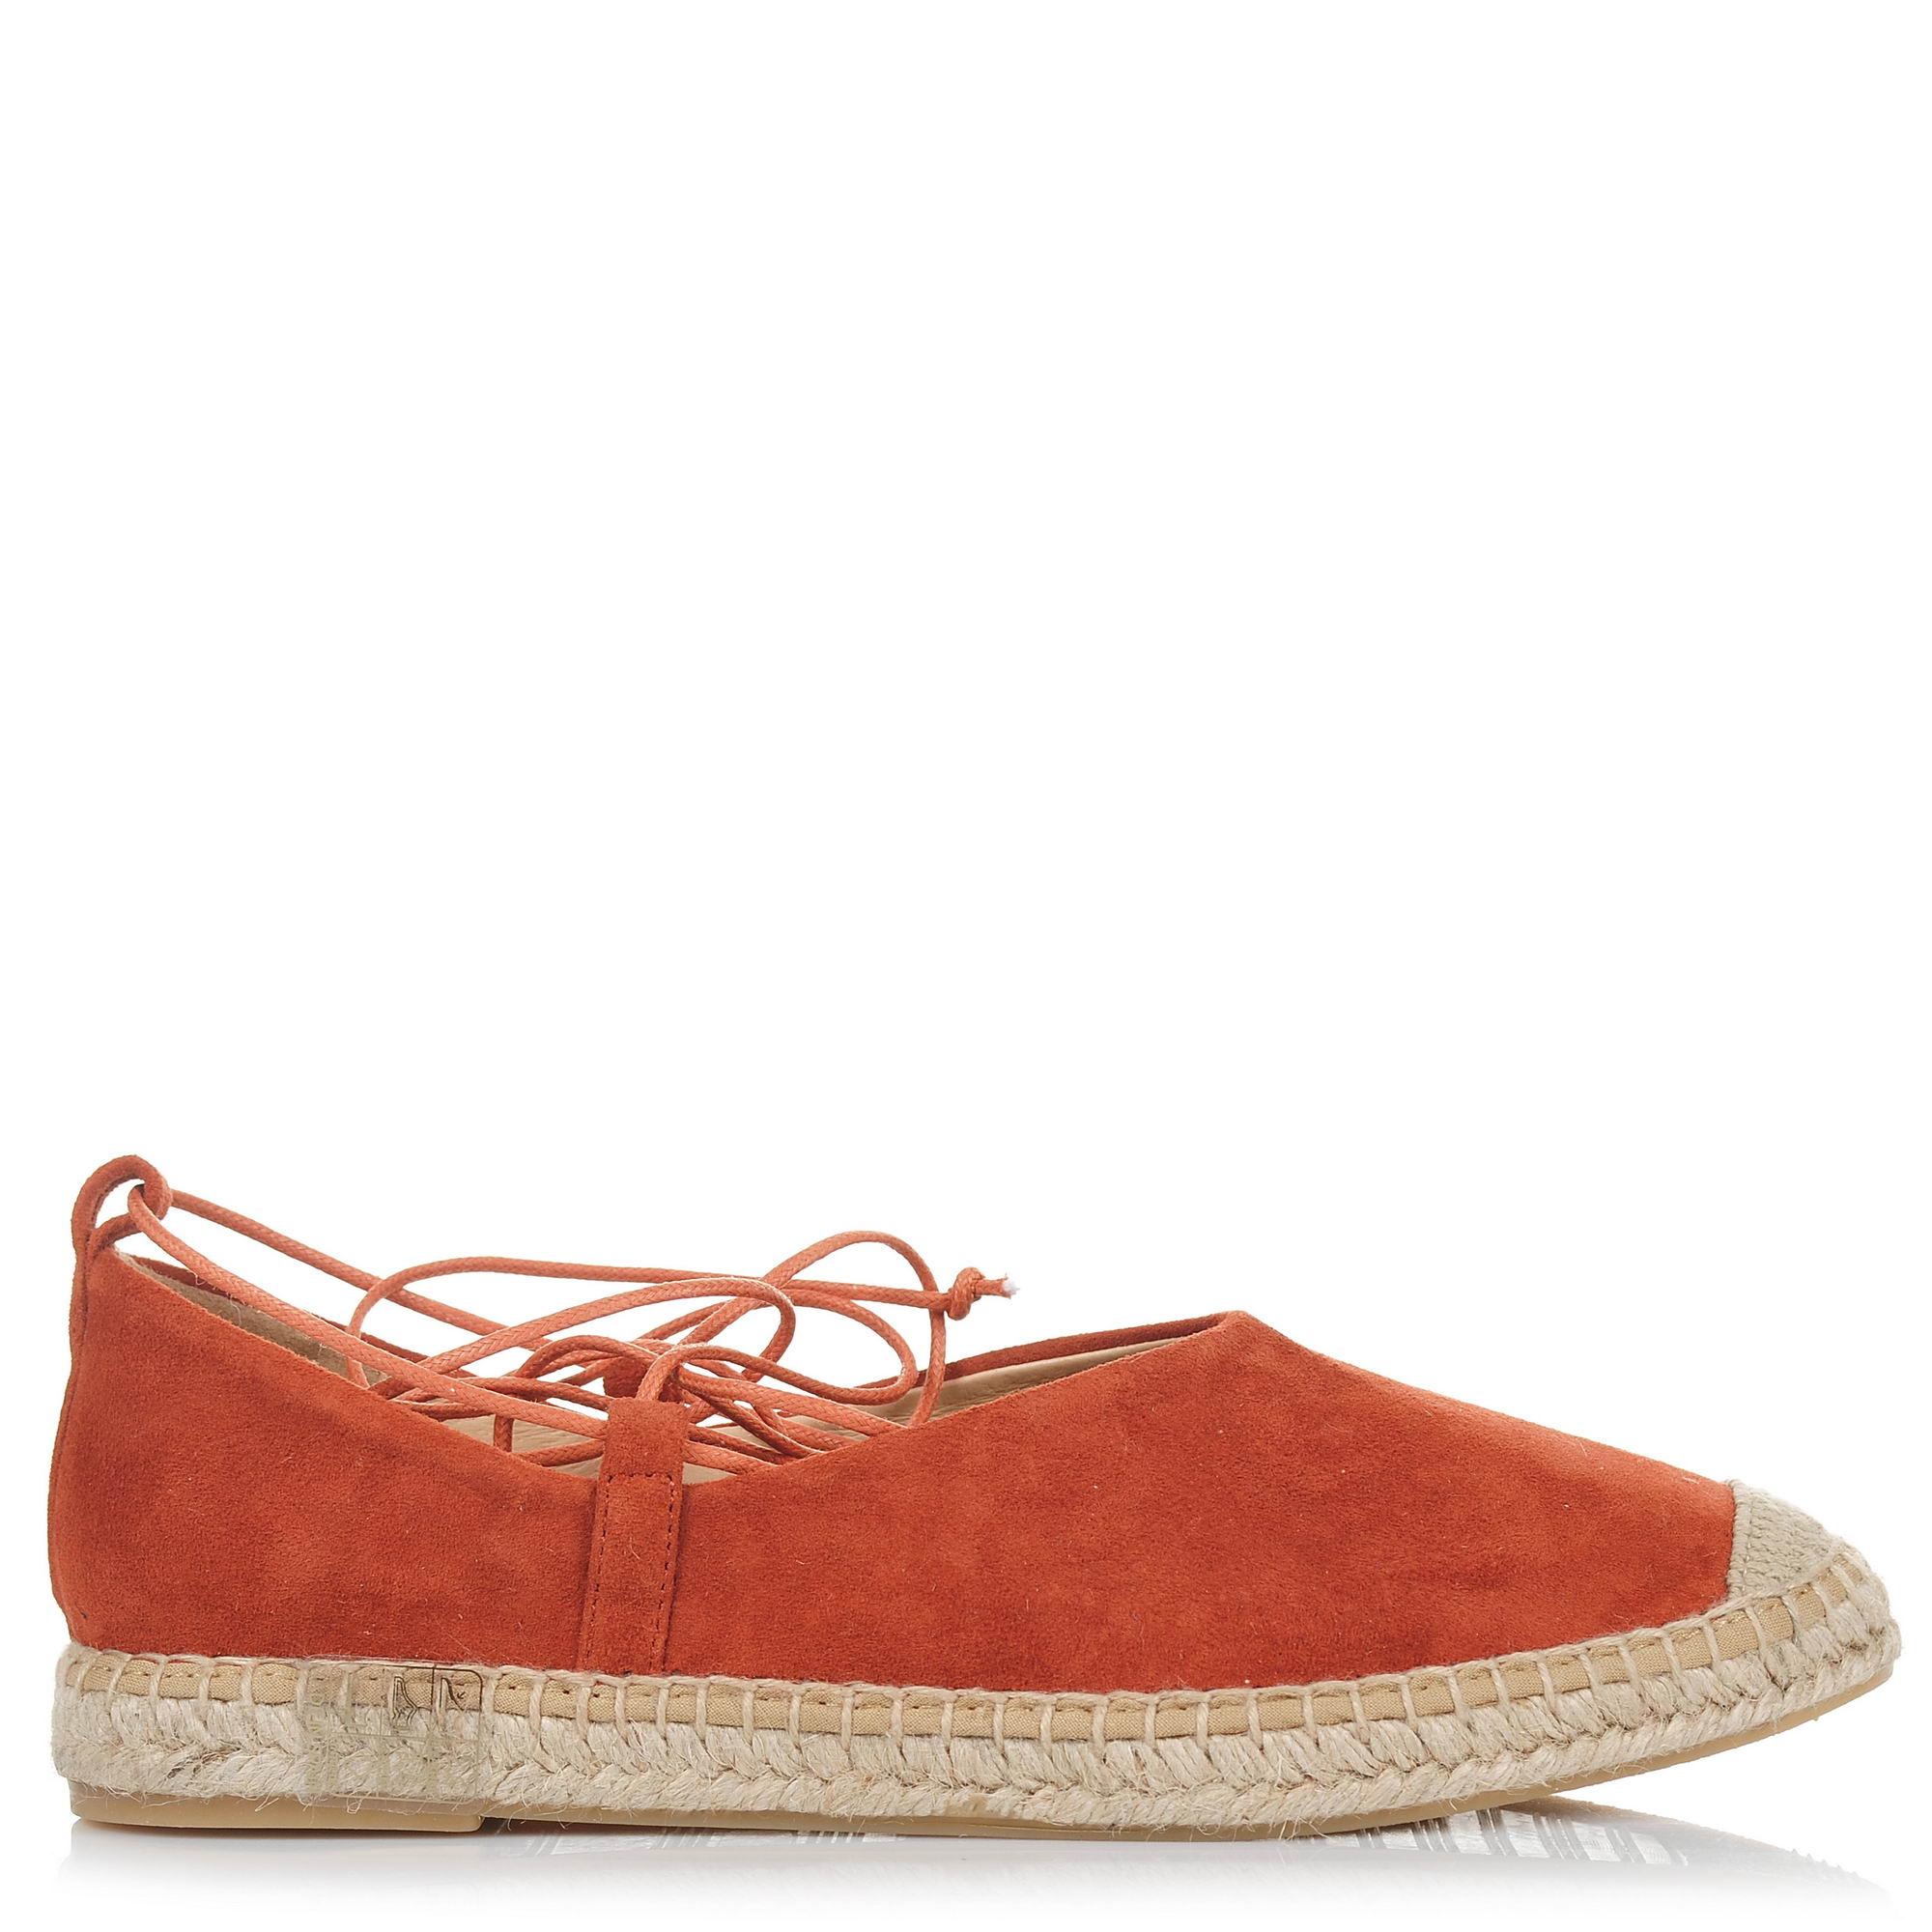 Suede Εσπαντρίγιες Kanna KV8033 γυναικα   γυναικείο παπούτσι